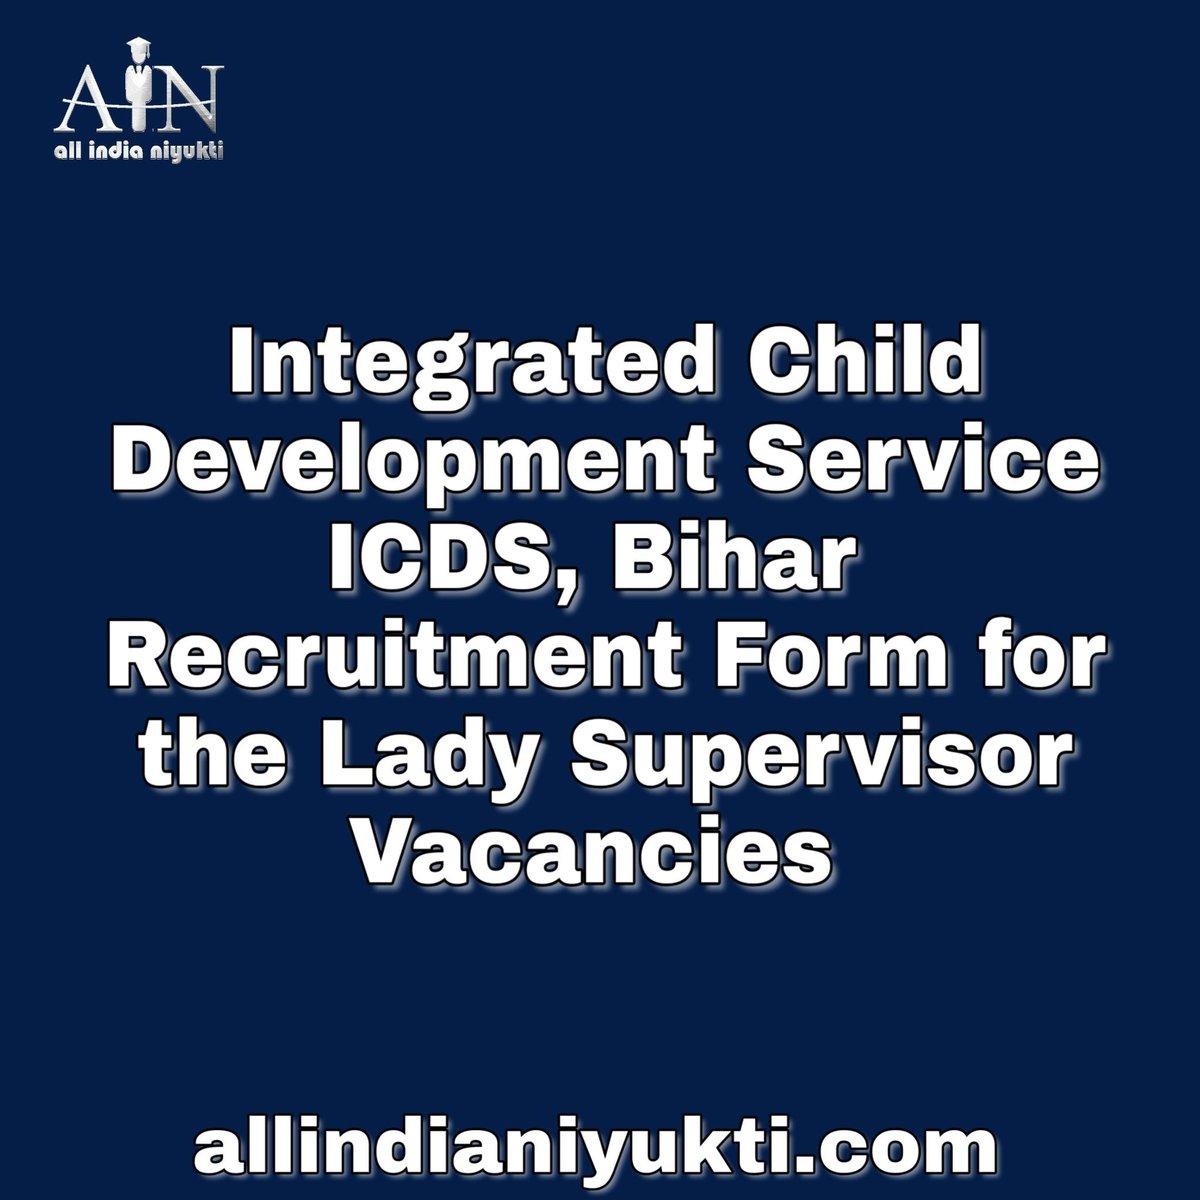 All-India-Niyukti (@AllIndiaNiyukti) | Twitter